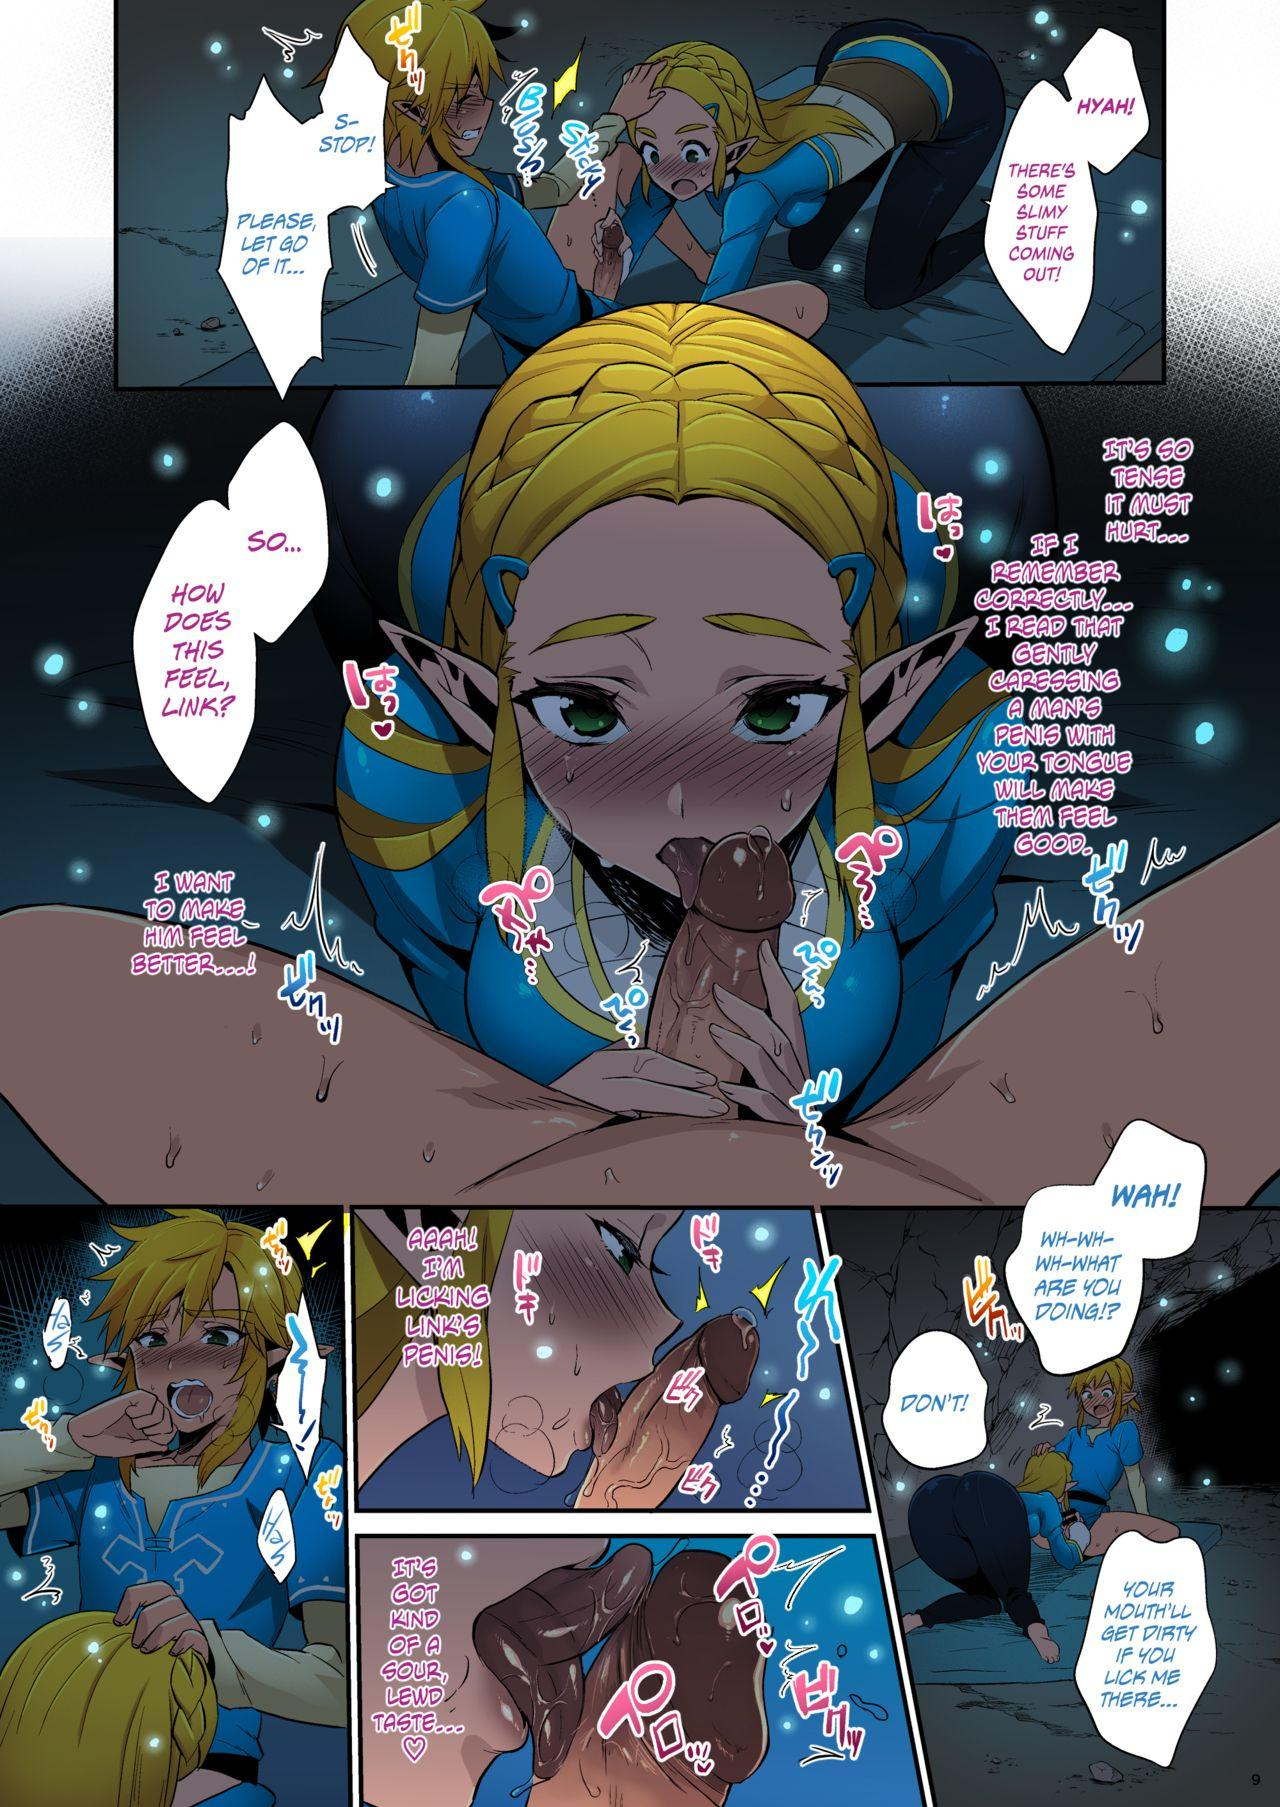 Hyrule Hanei no Tame no Katsudou!   Taking Steps to Ensure Hyrule's Prosperity! 9